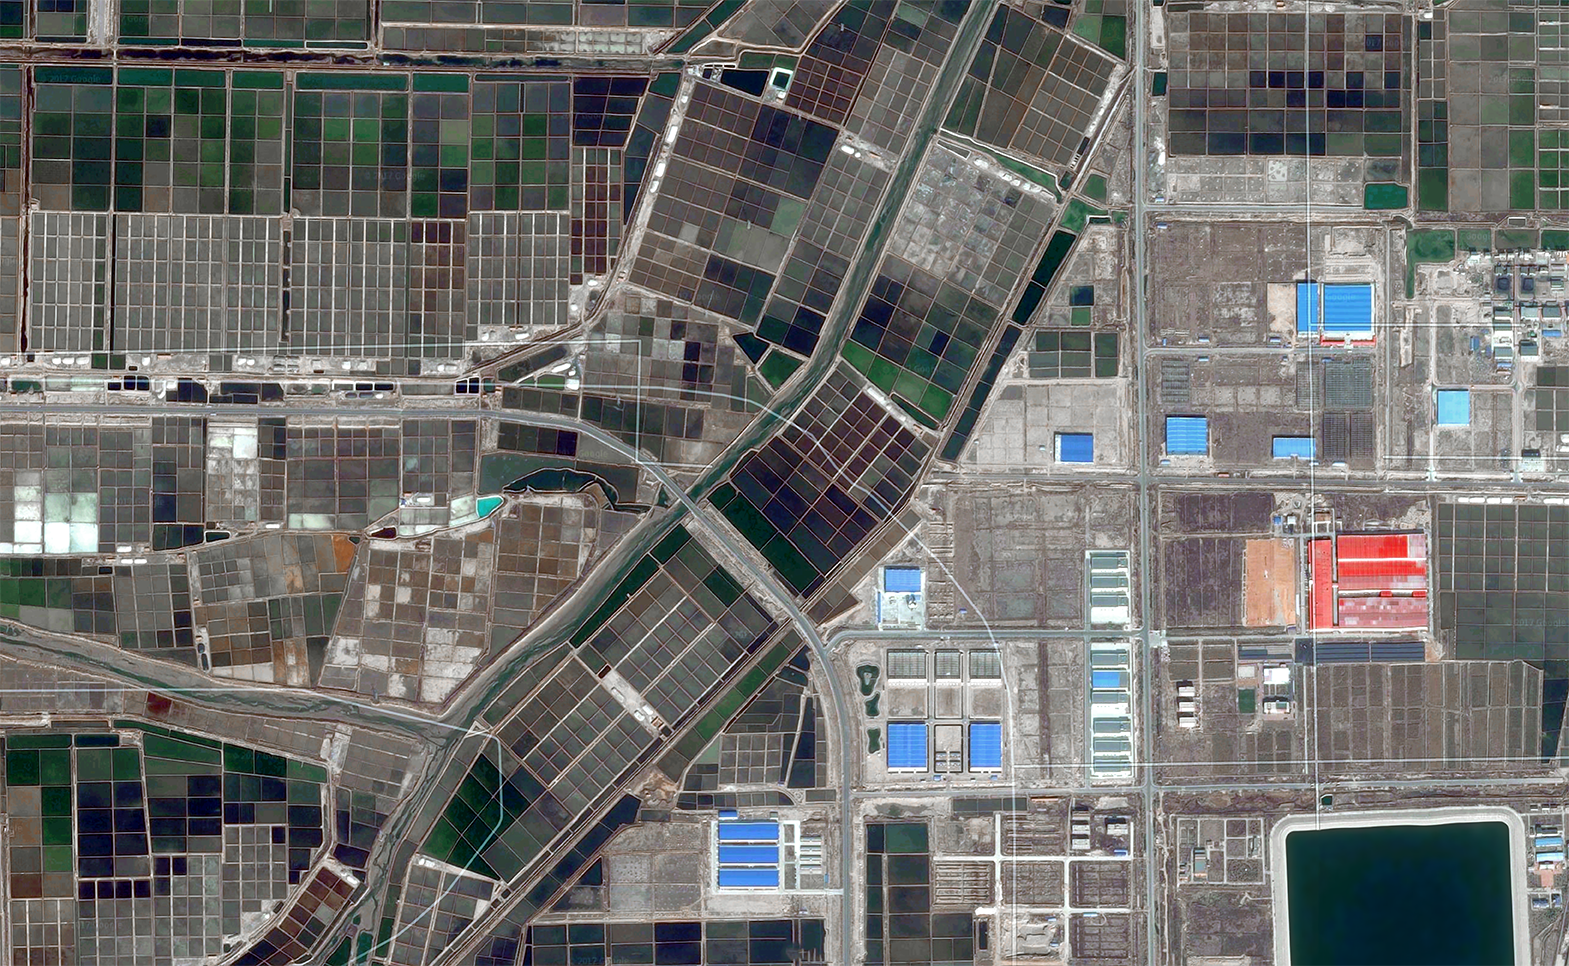 Google Earth: China